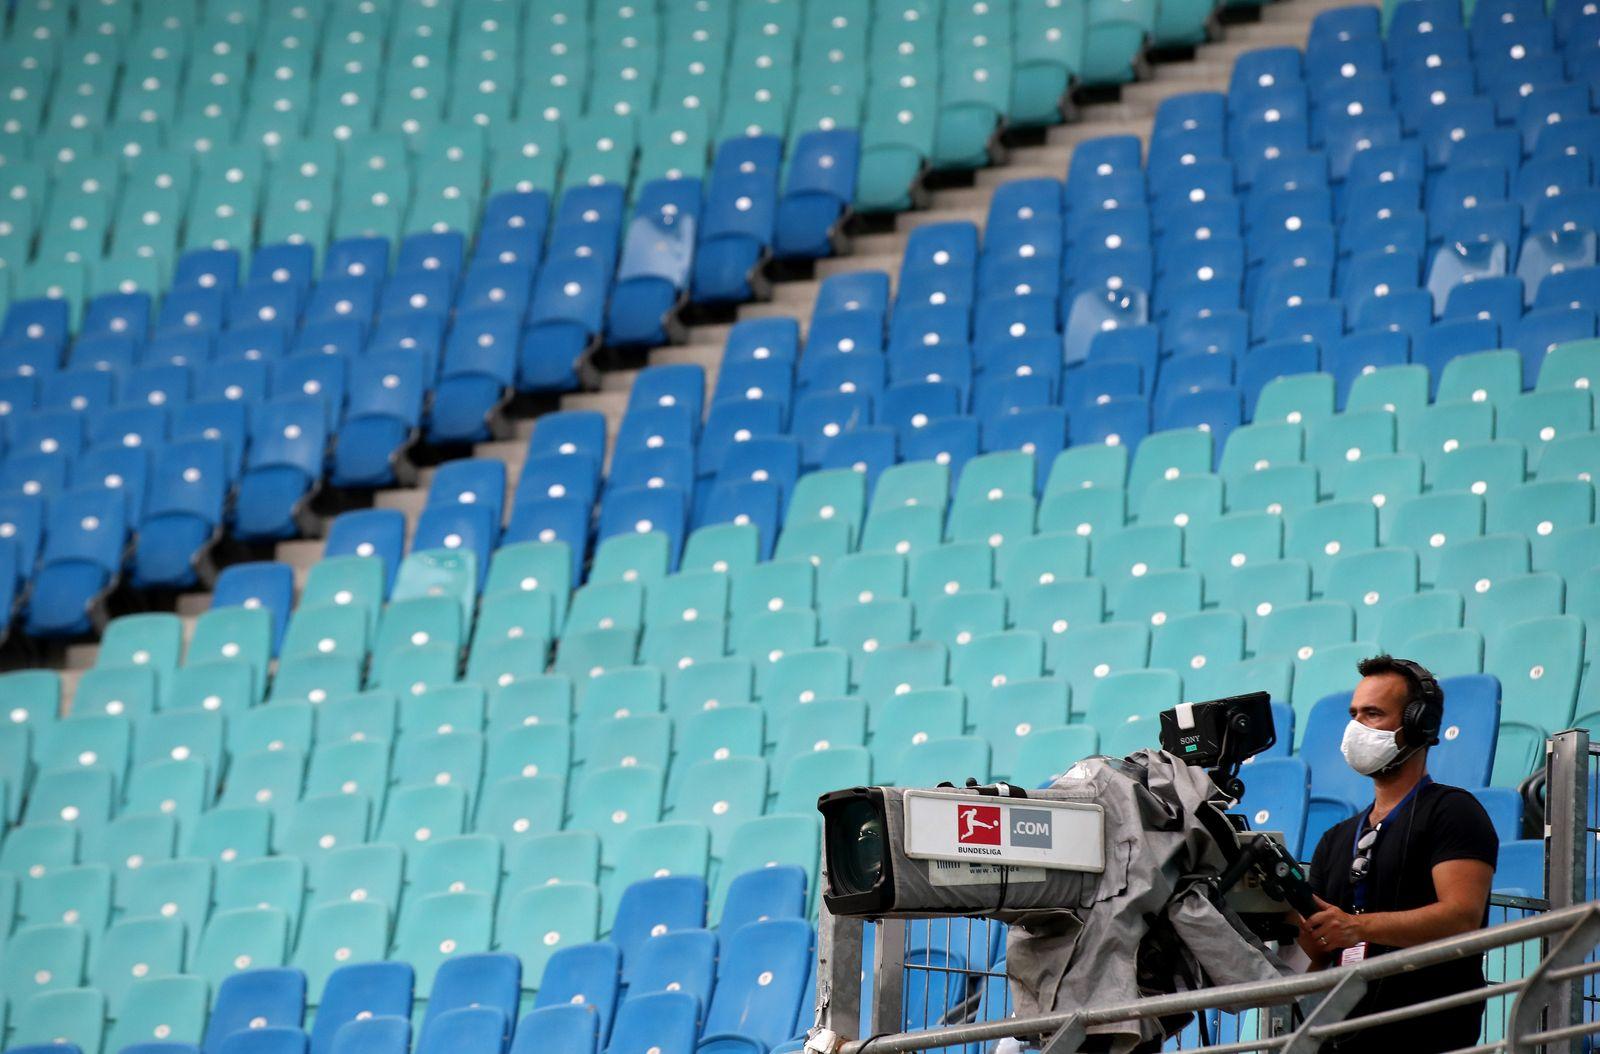 RB Leipzig vs Fortuna Duesseldorf, Germany - 17 Jun 2020